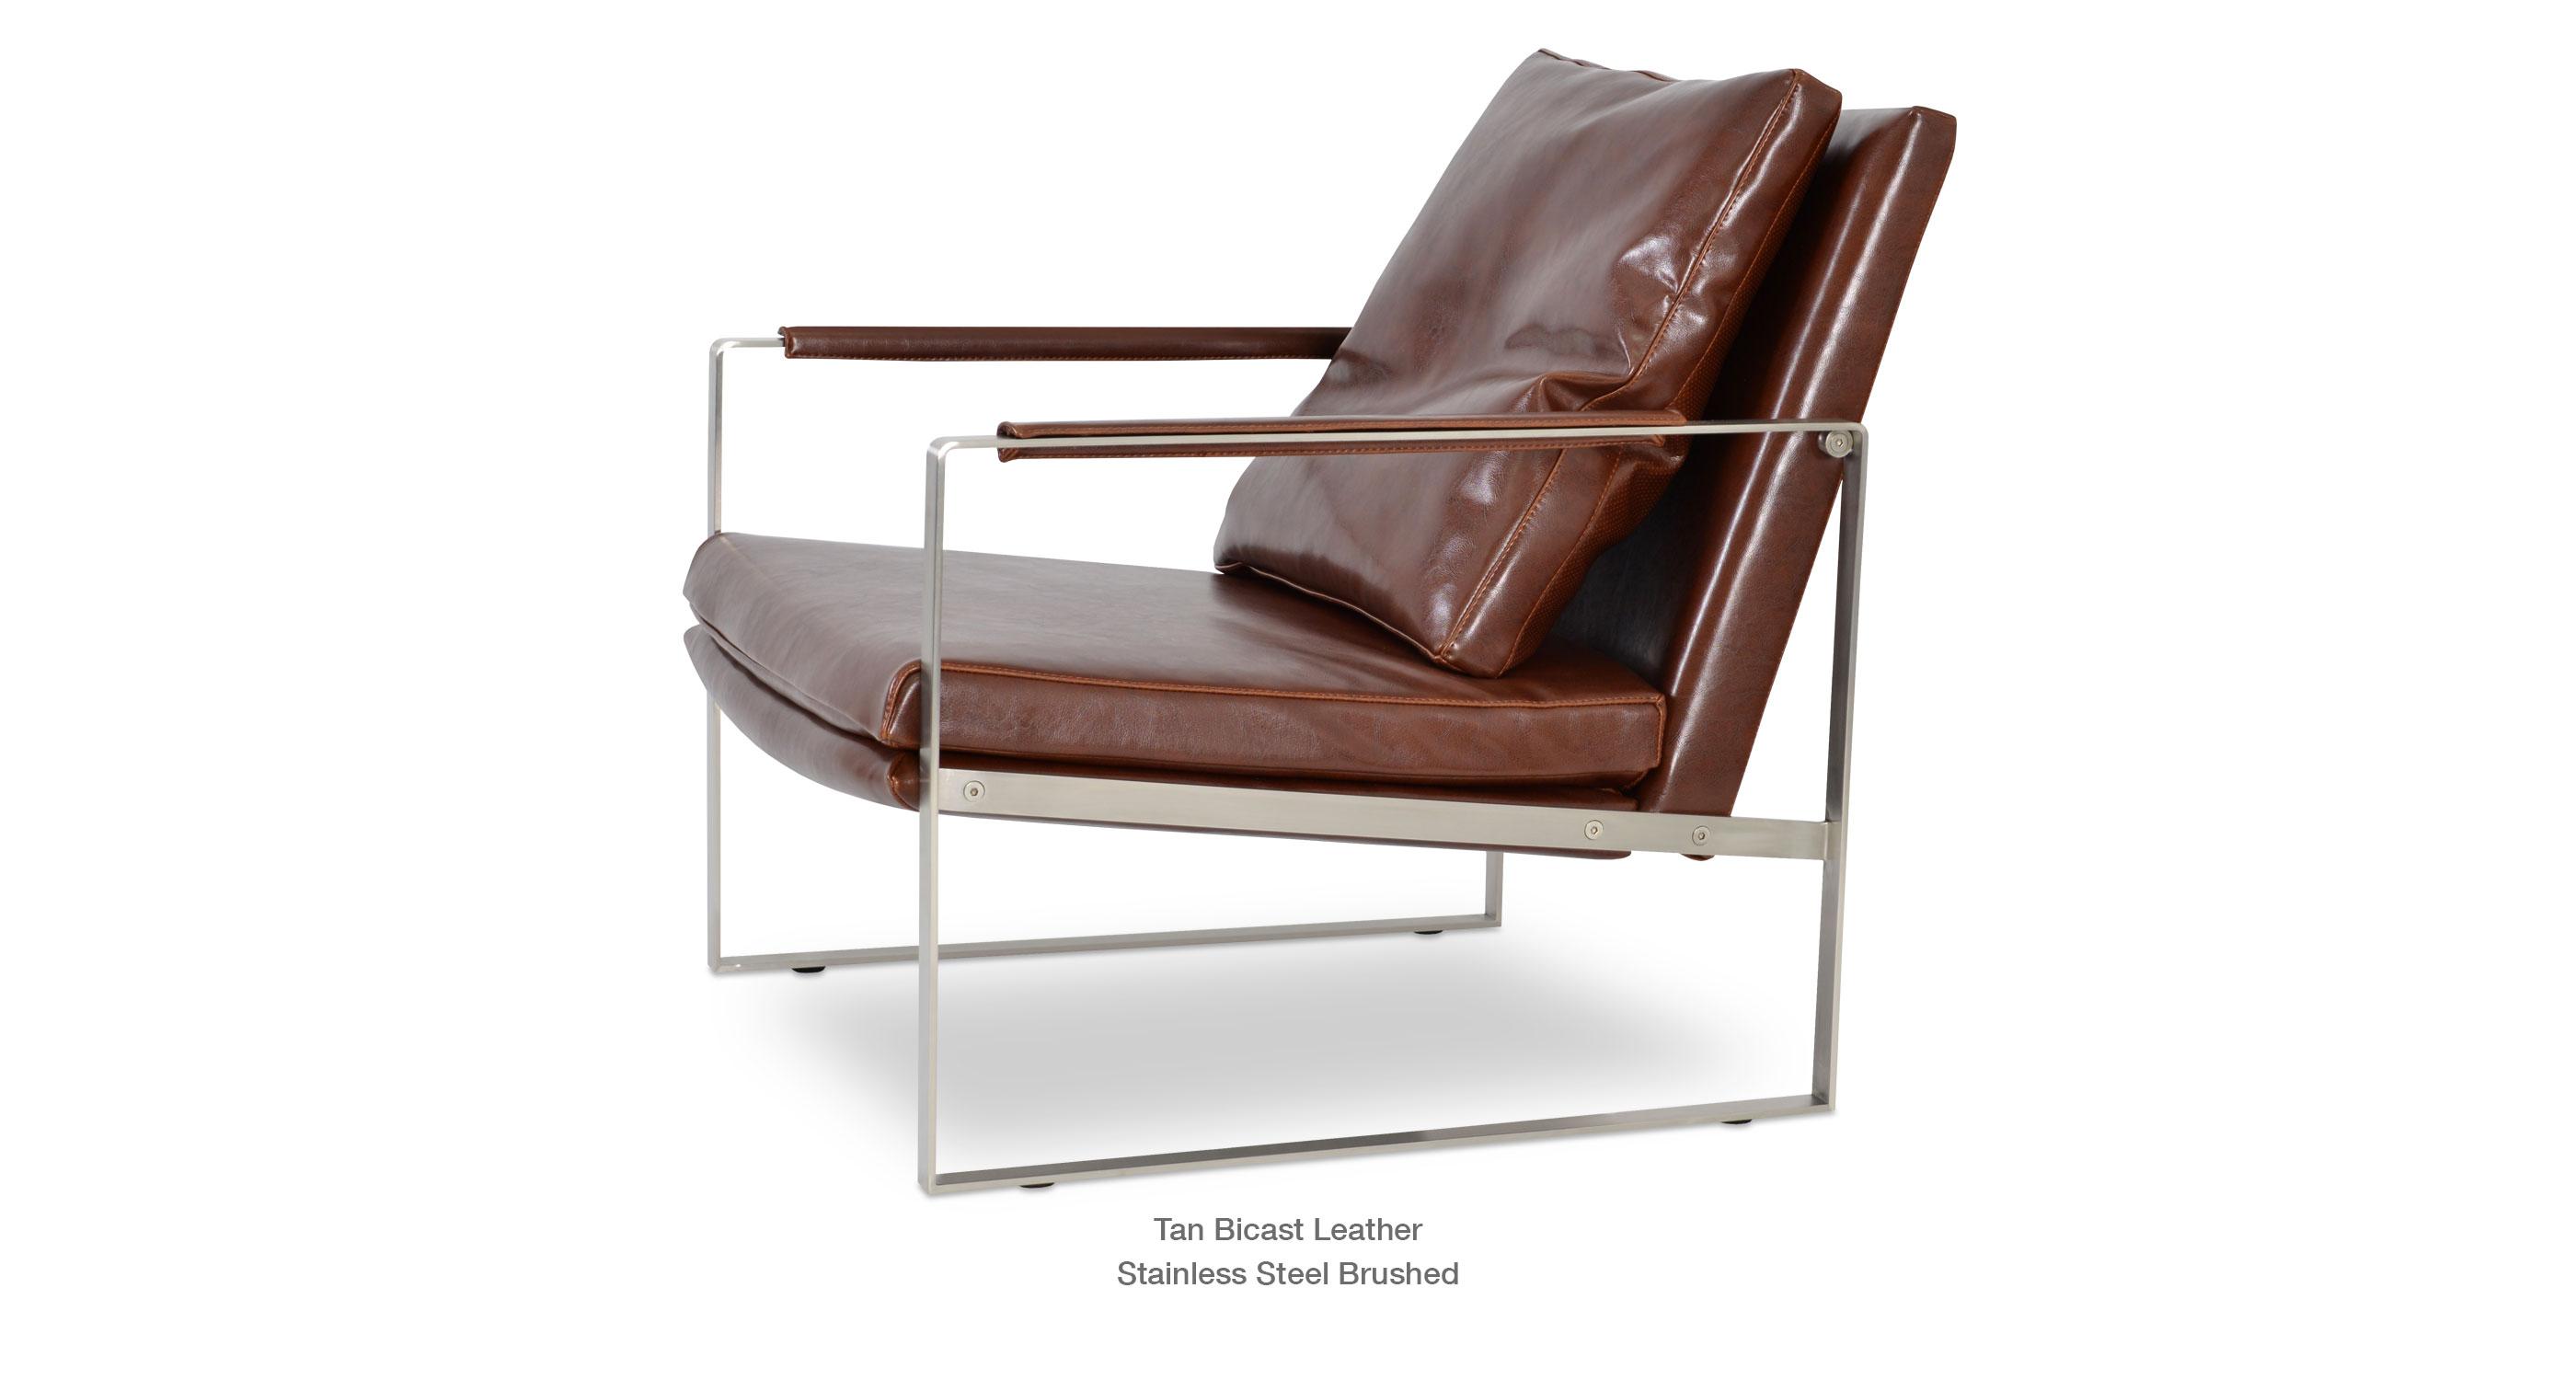 Bicast Leather Sofa Images White Leather Sofa Decor  : zaratanbicast from flowersaustralia.co size 2800 x 1500 jpeg 205kB